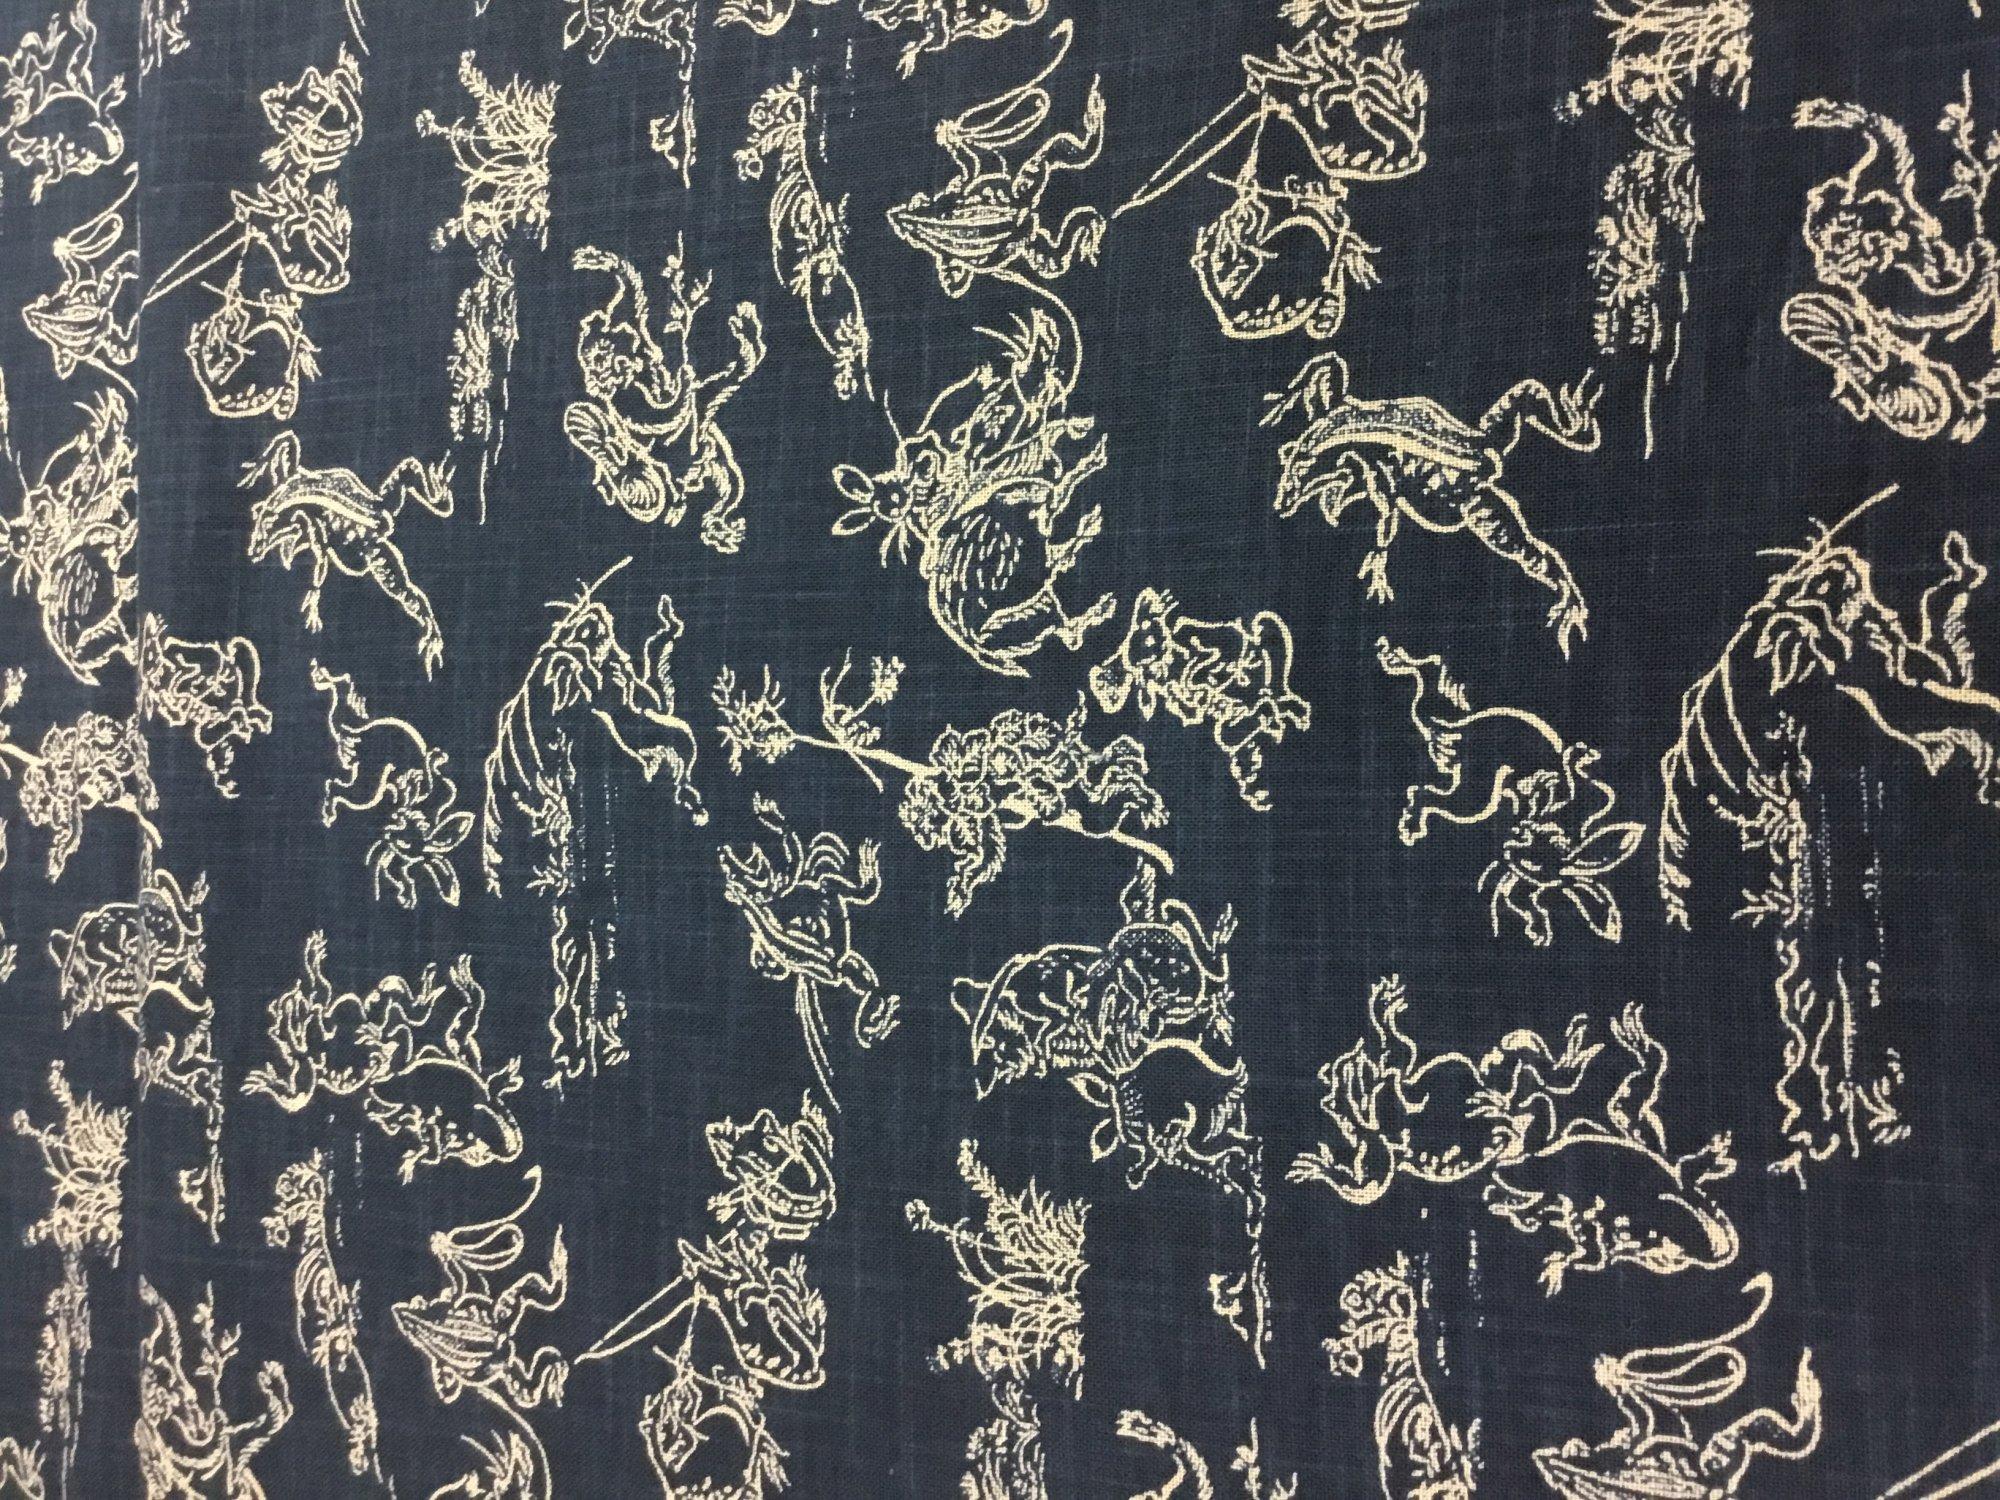 Japanese Woven - Character Print